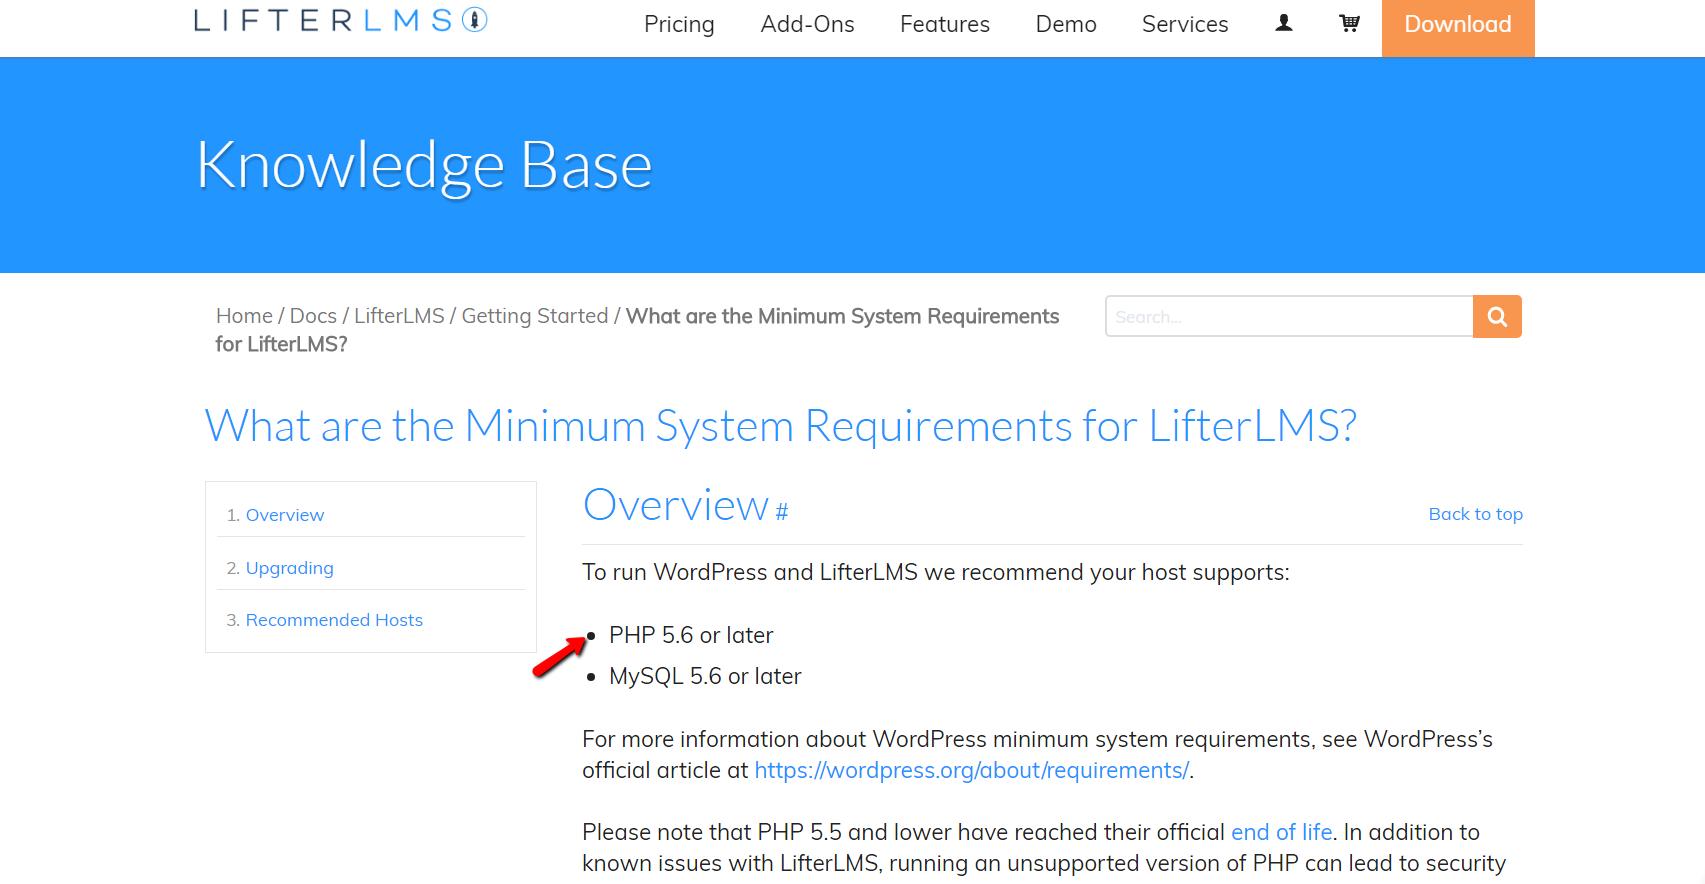 Screenshot of LifterLMS Knowledge Base